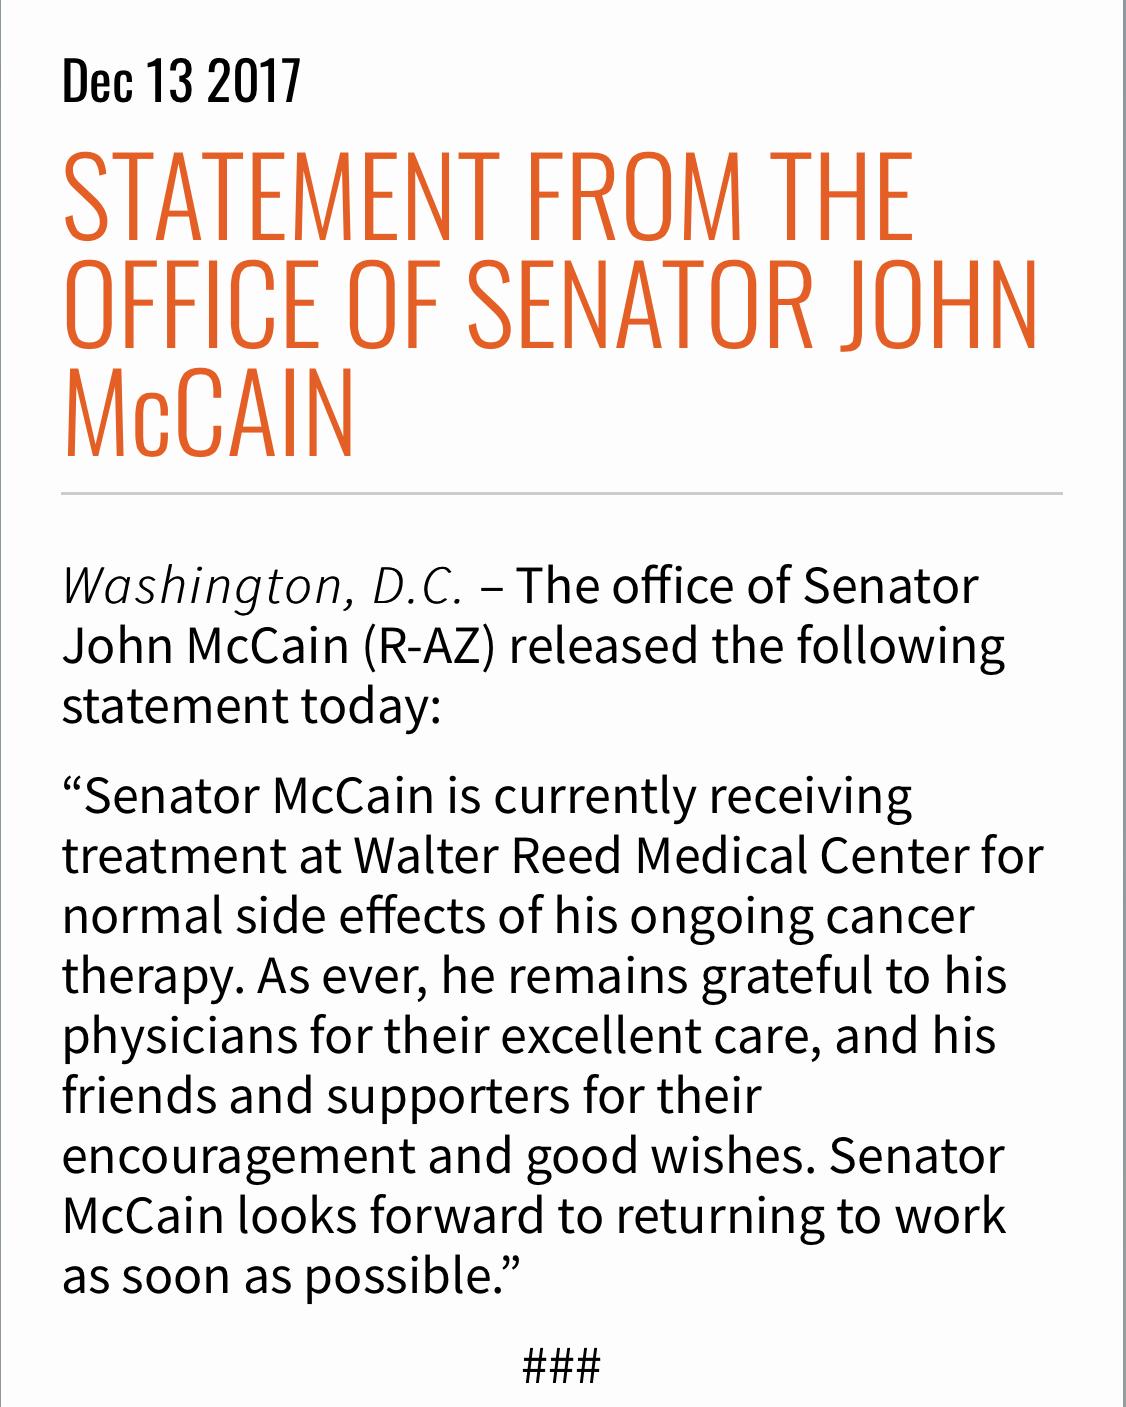 Sen  John McCain At Walter Reed Medical Center For 'Side